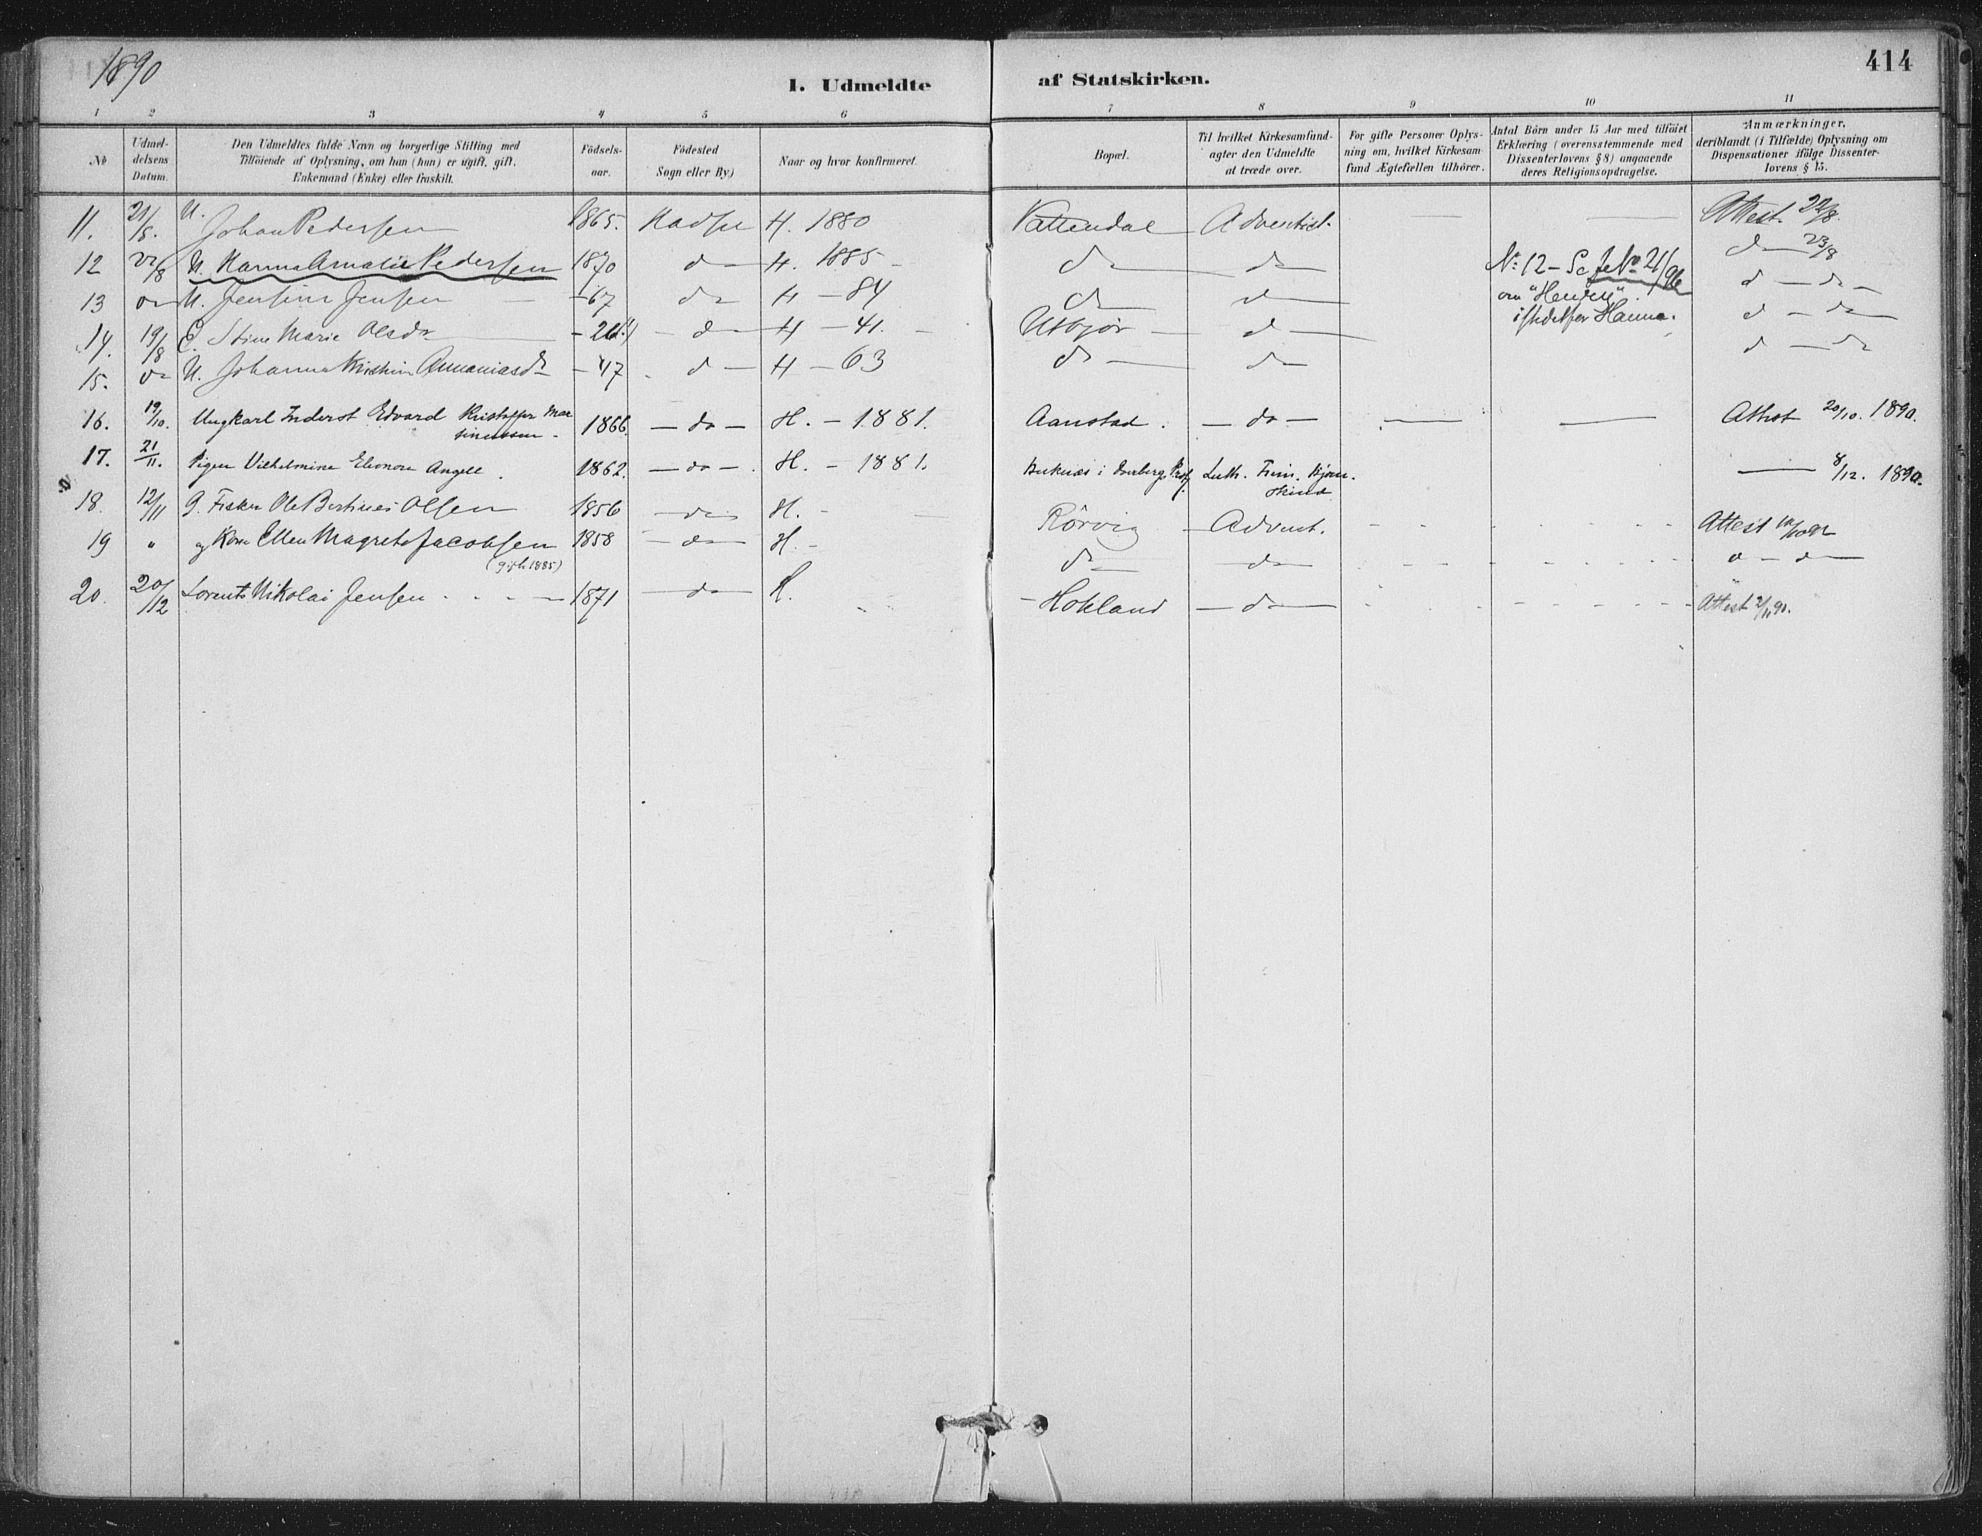 SAT, Ministerialprotokoller, klokkerbøker og fødselsregistre - Nordland, 888/L1244: Ministerialbok nr. 888A10, 1880-1890, s. 414